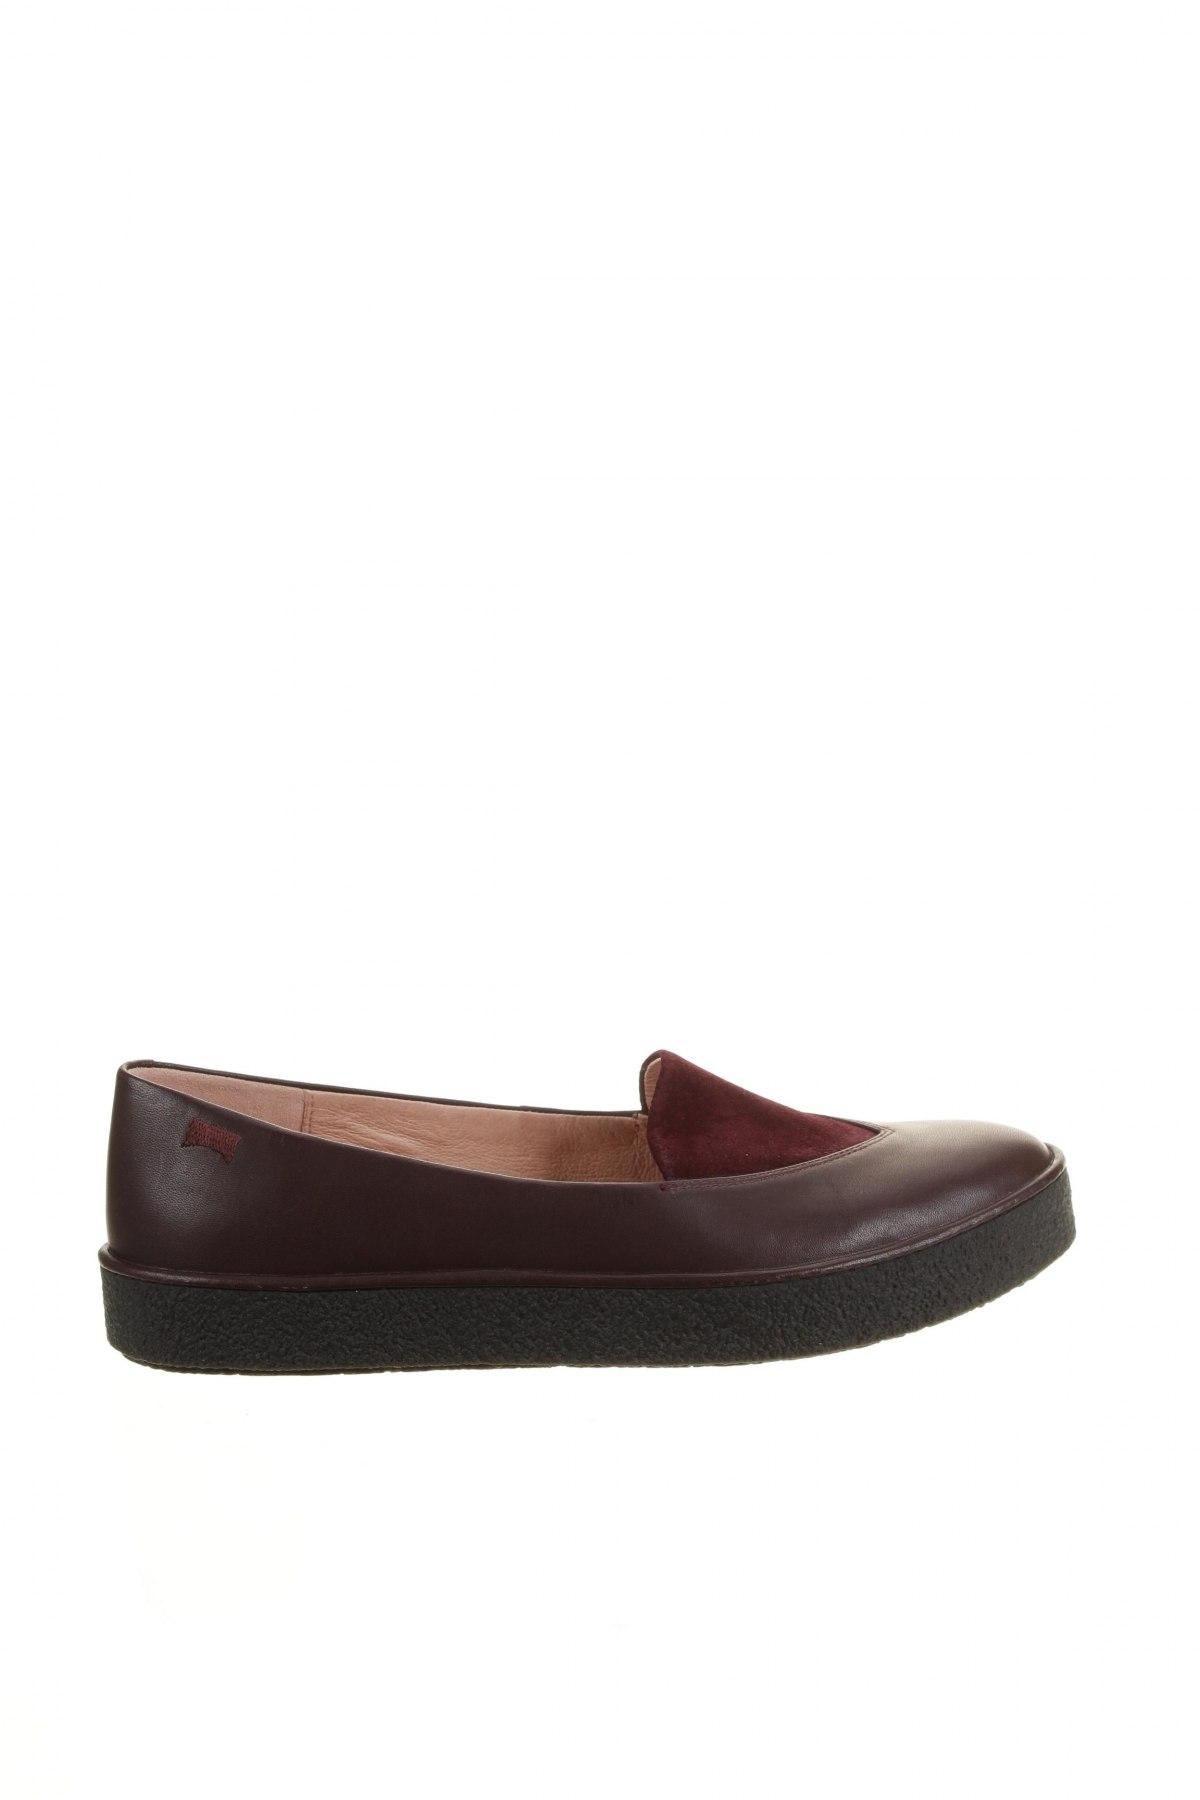 804d1df4b0c Γυναικεία παπούτσια Camper - σε συμφέρουσα τιμή στο Remix - #102163219